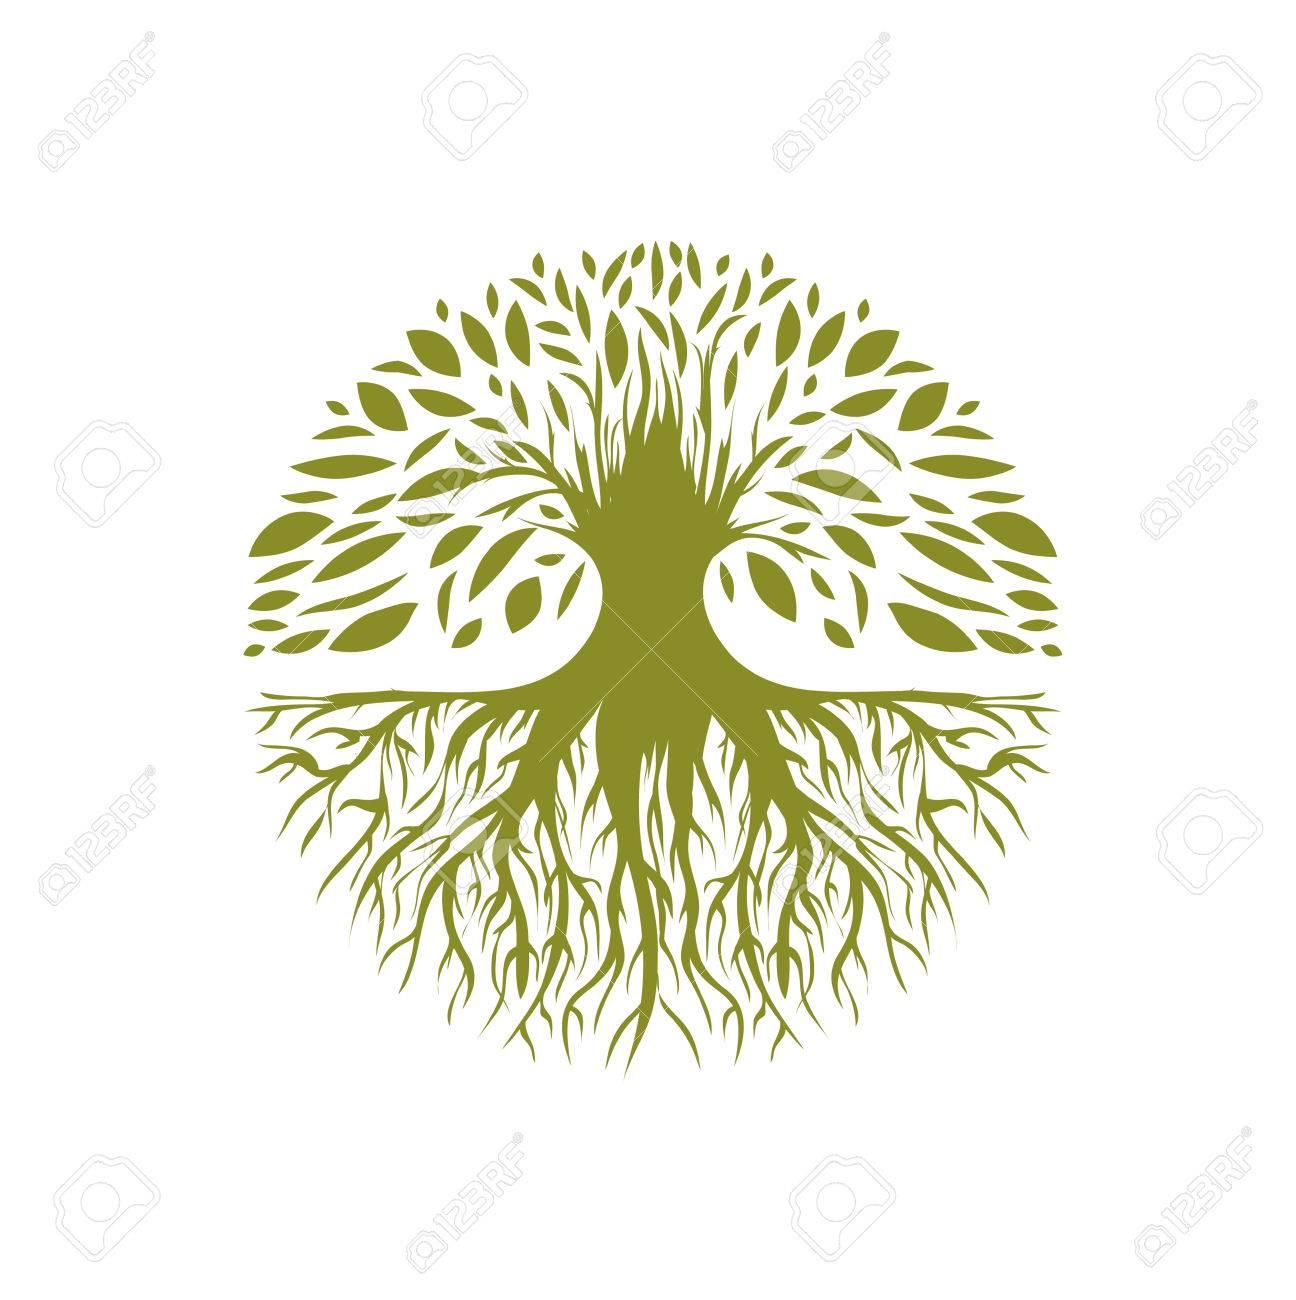 Illustration of Abstract Round Tree - 38935819